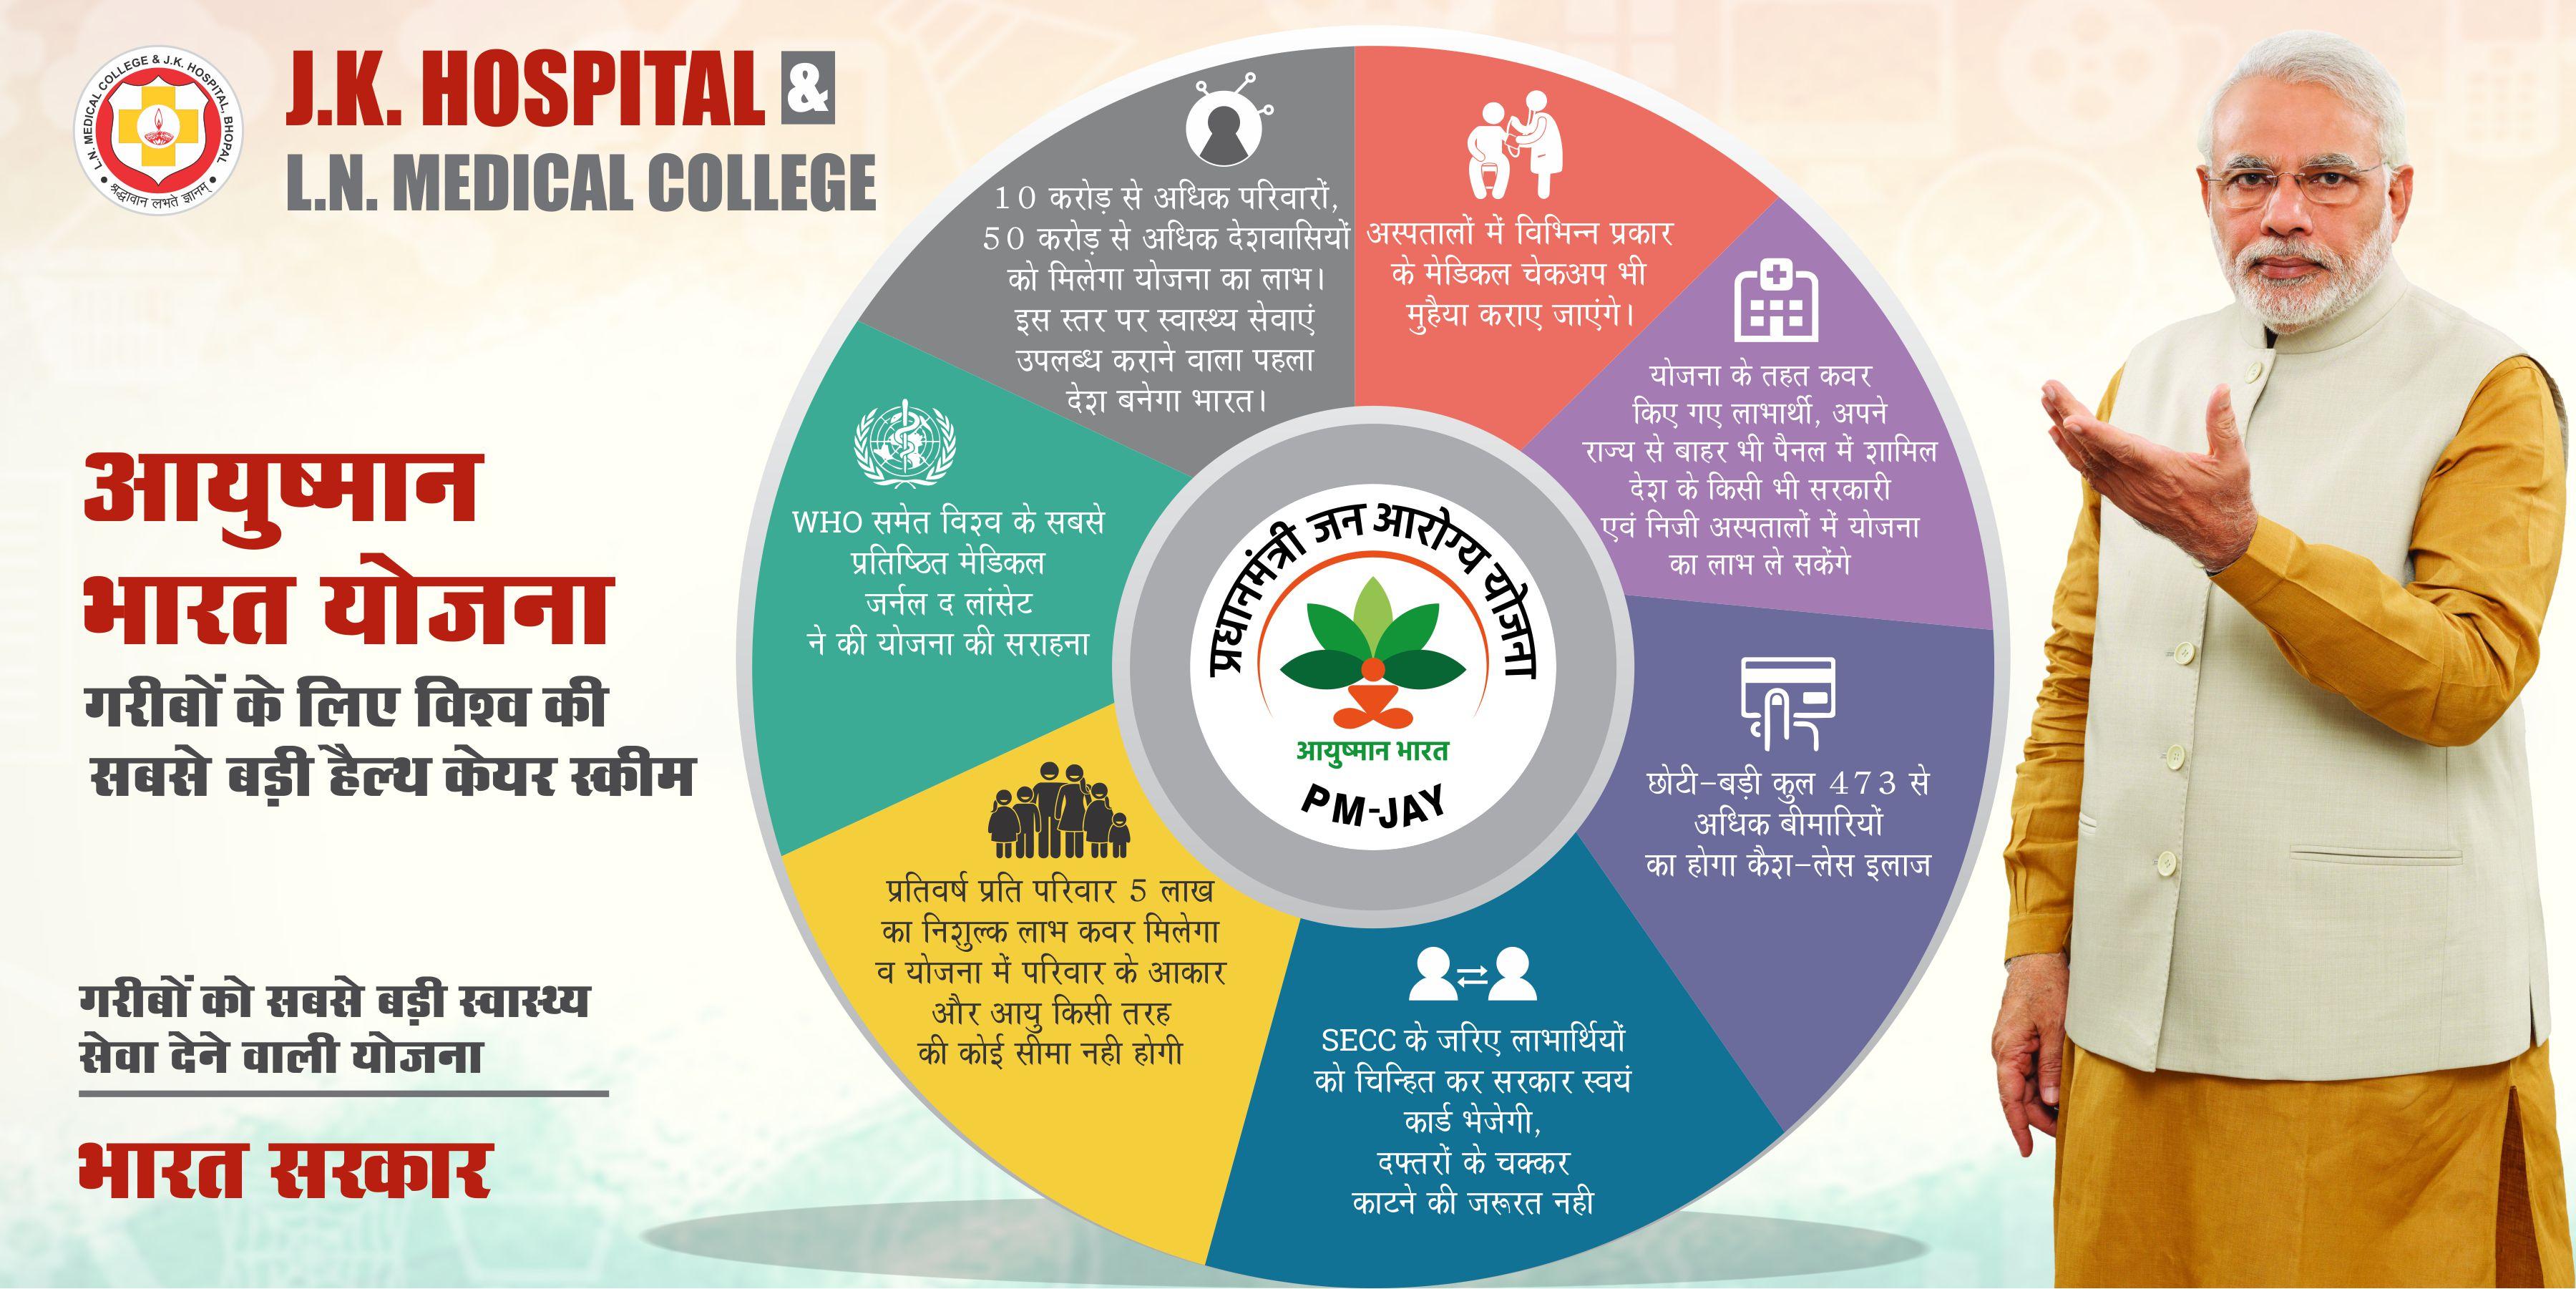 j k hospital joins ayushman bharat scheme lnct university